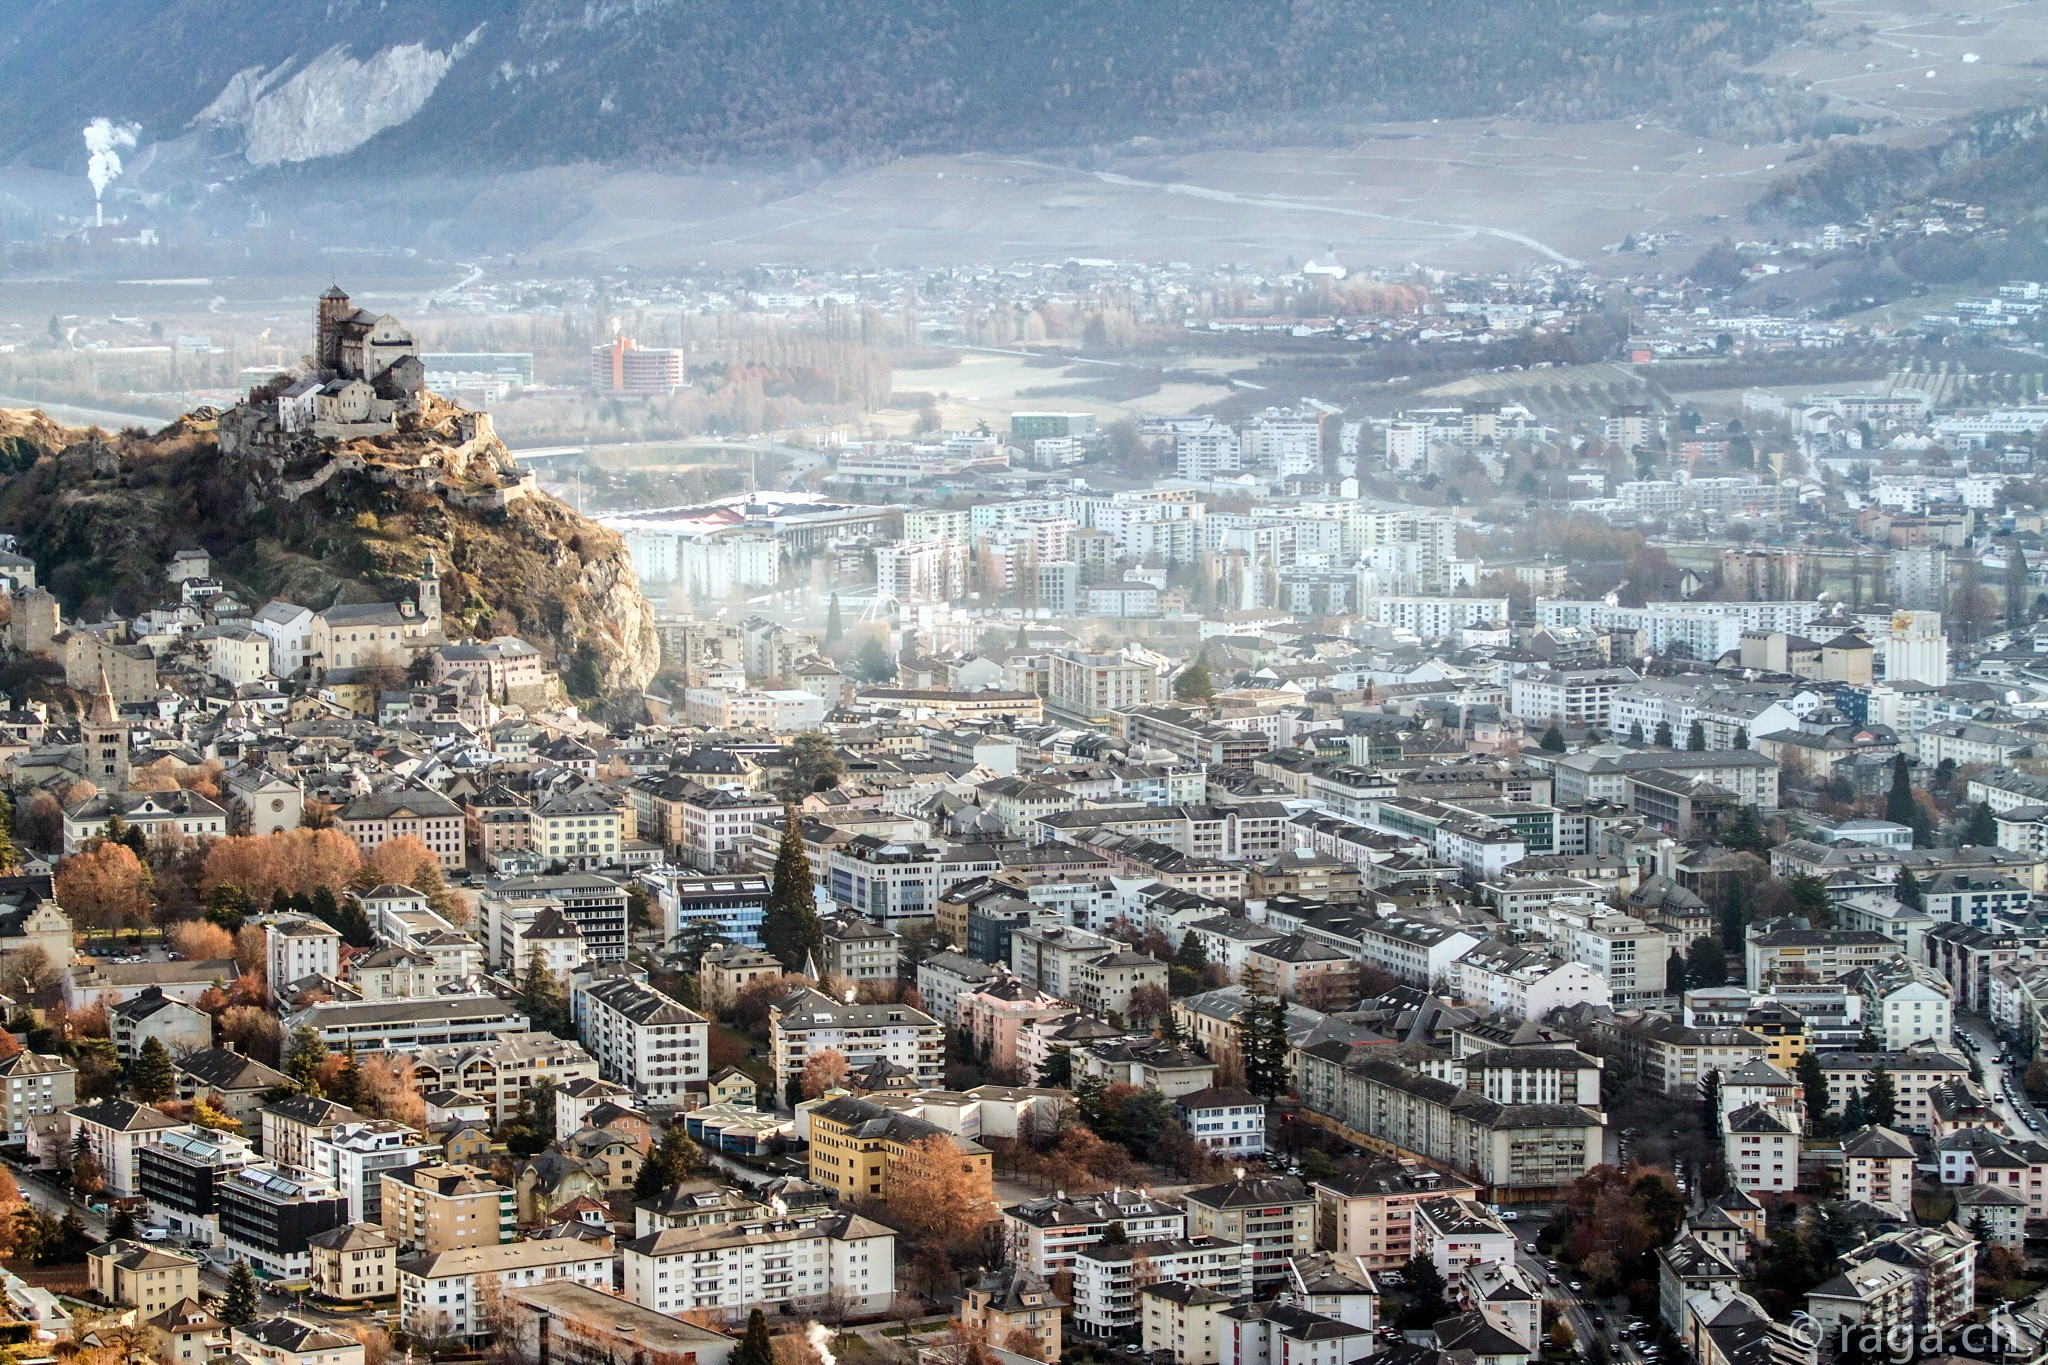 General 2048x1365 city Switzerland cityscape mountains Sierre